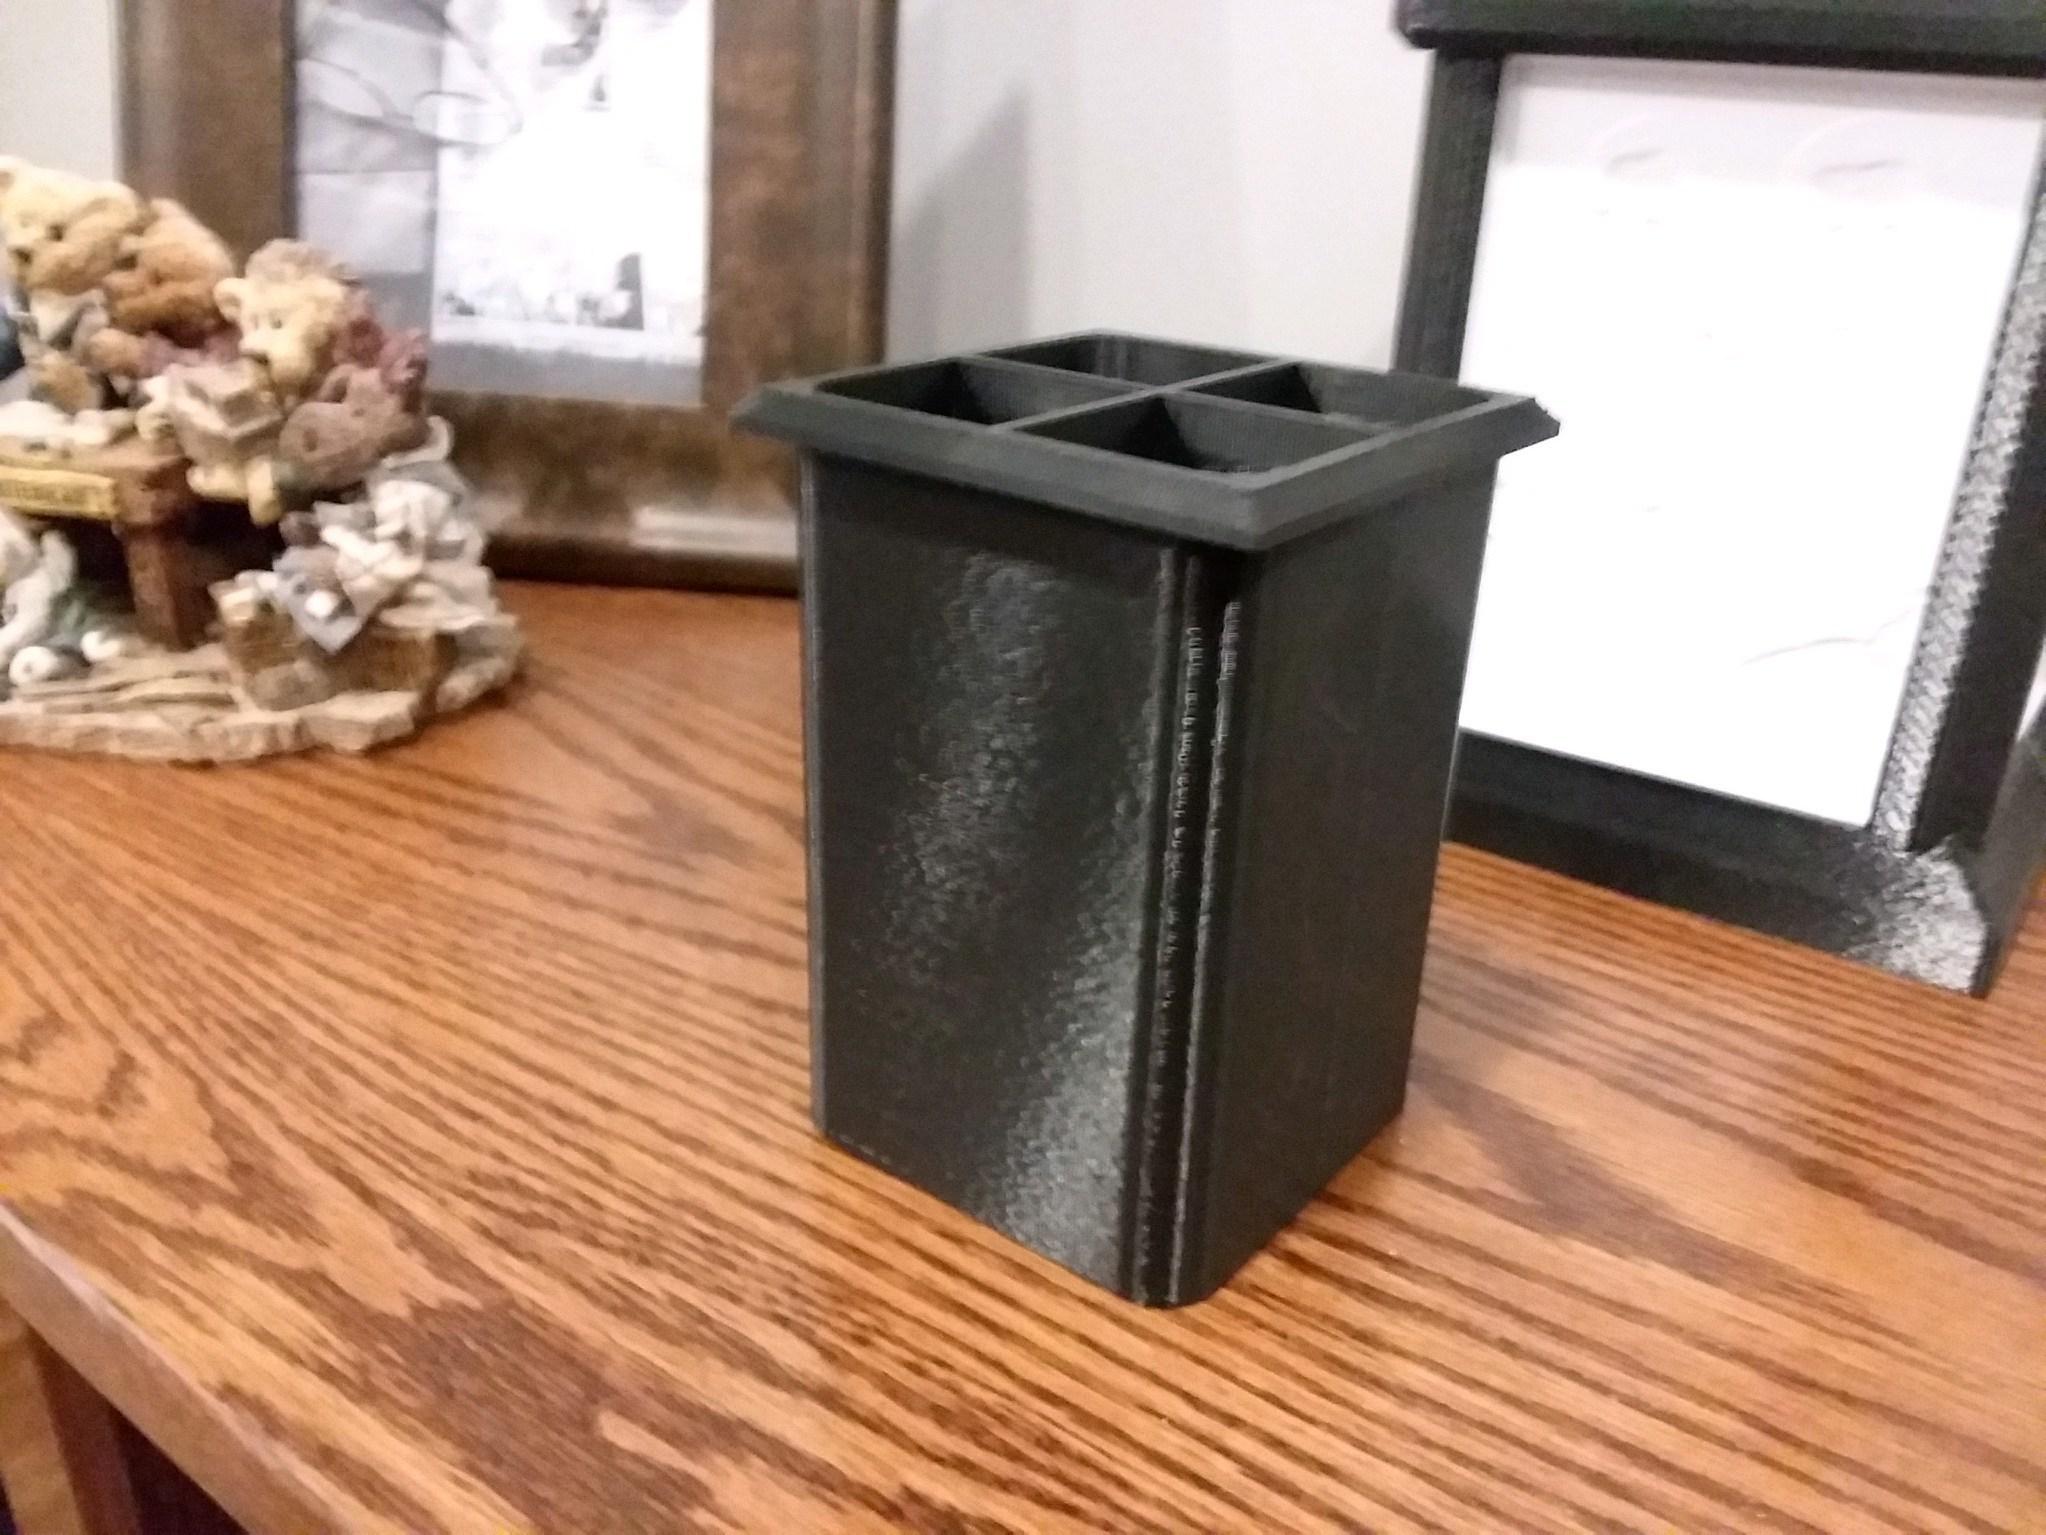 Photo_Jan_29_3_36_44_PM.jpg Download free STL file Lithophane Light Box Desktop Organizer Pencil • 3D print object, HoytDesign